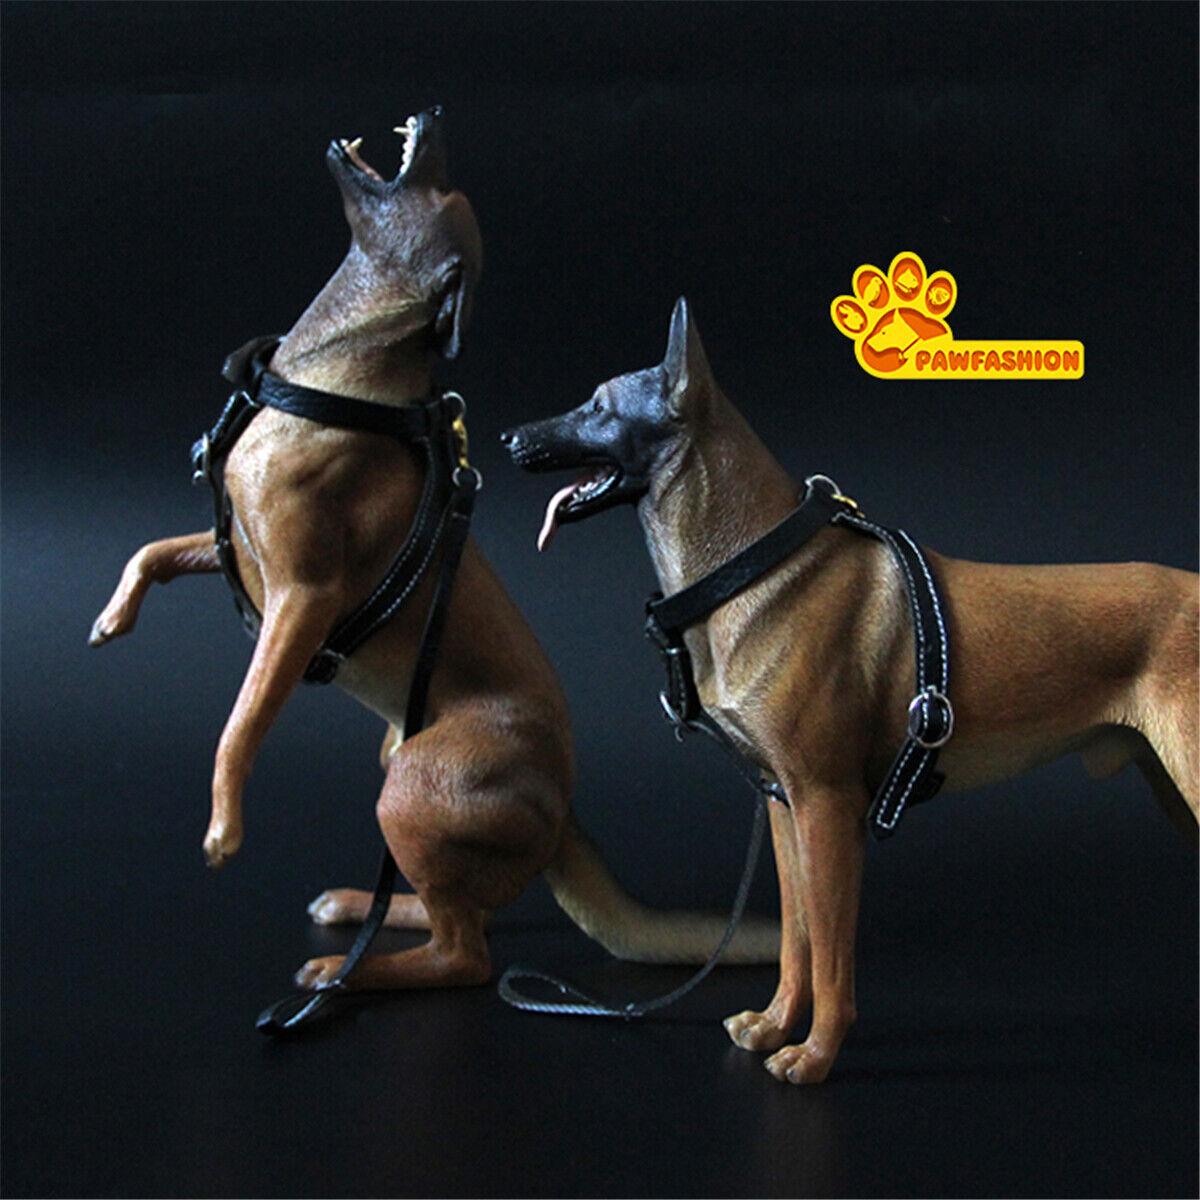 Pawfashion 1 6 Belga Malinois Perro Mascota Figura Animal Colector Modelo Juguete Regalo